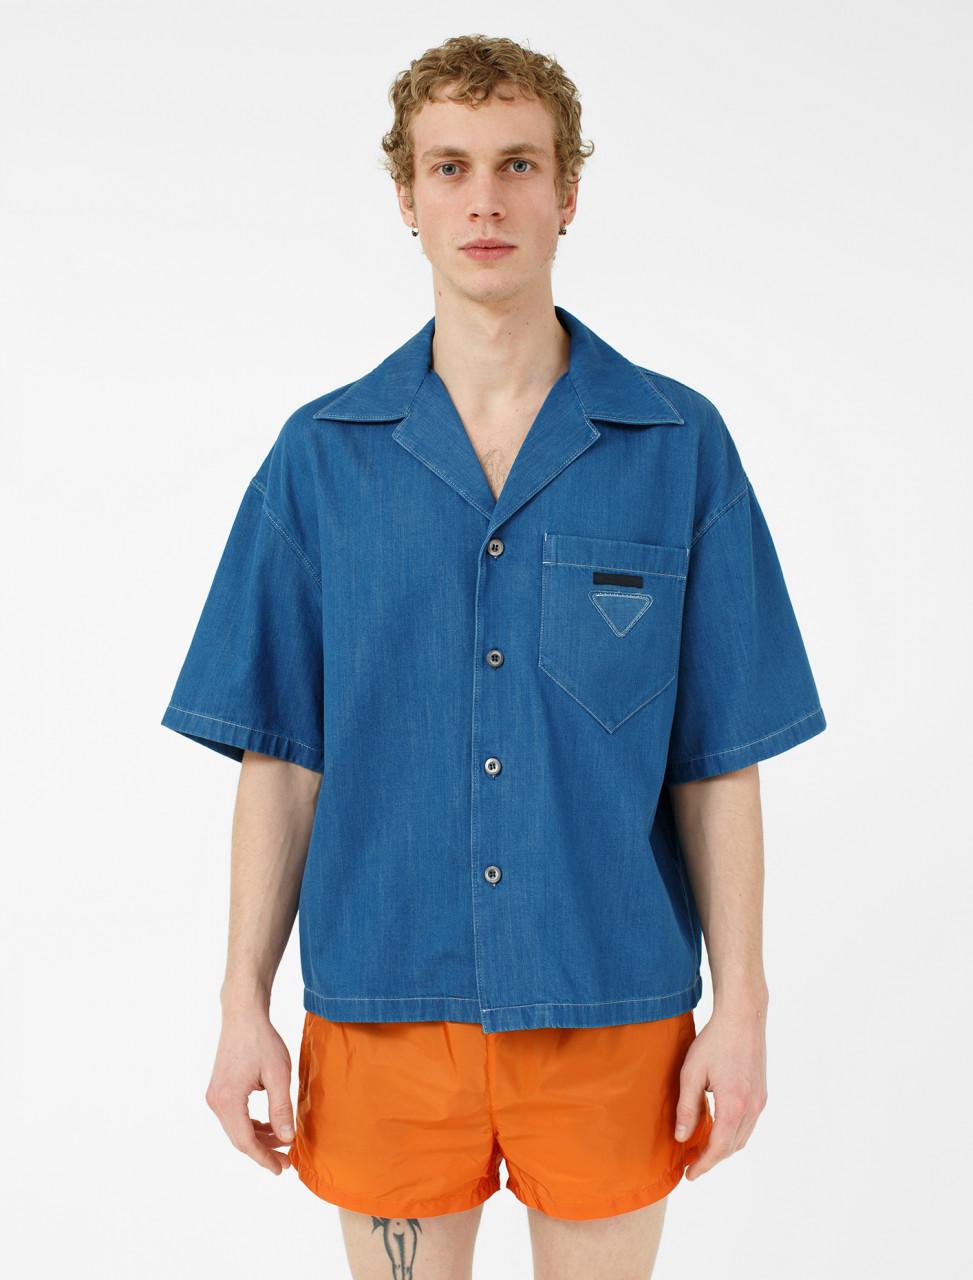 Denim Shirt in Faded Blue